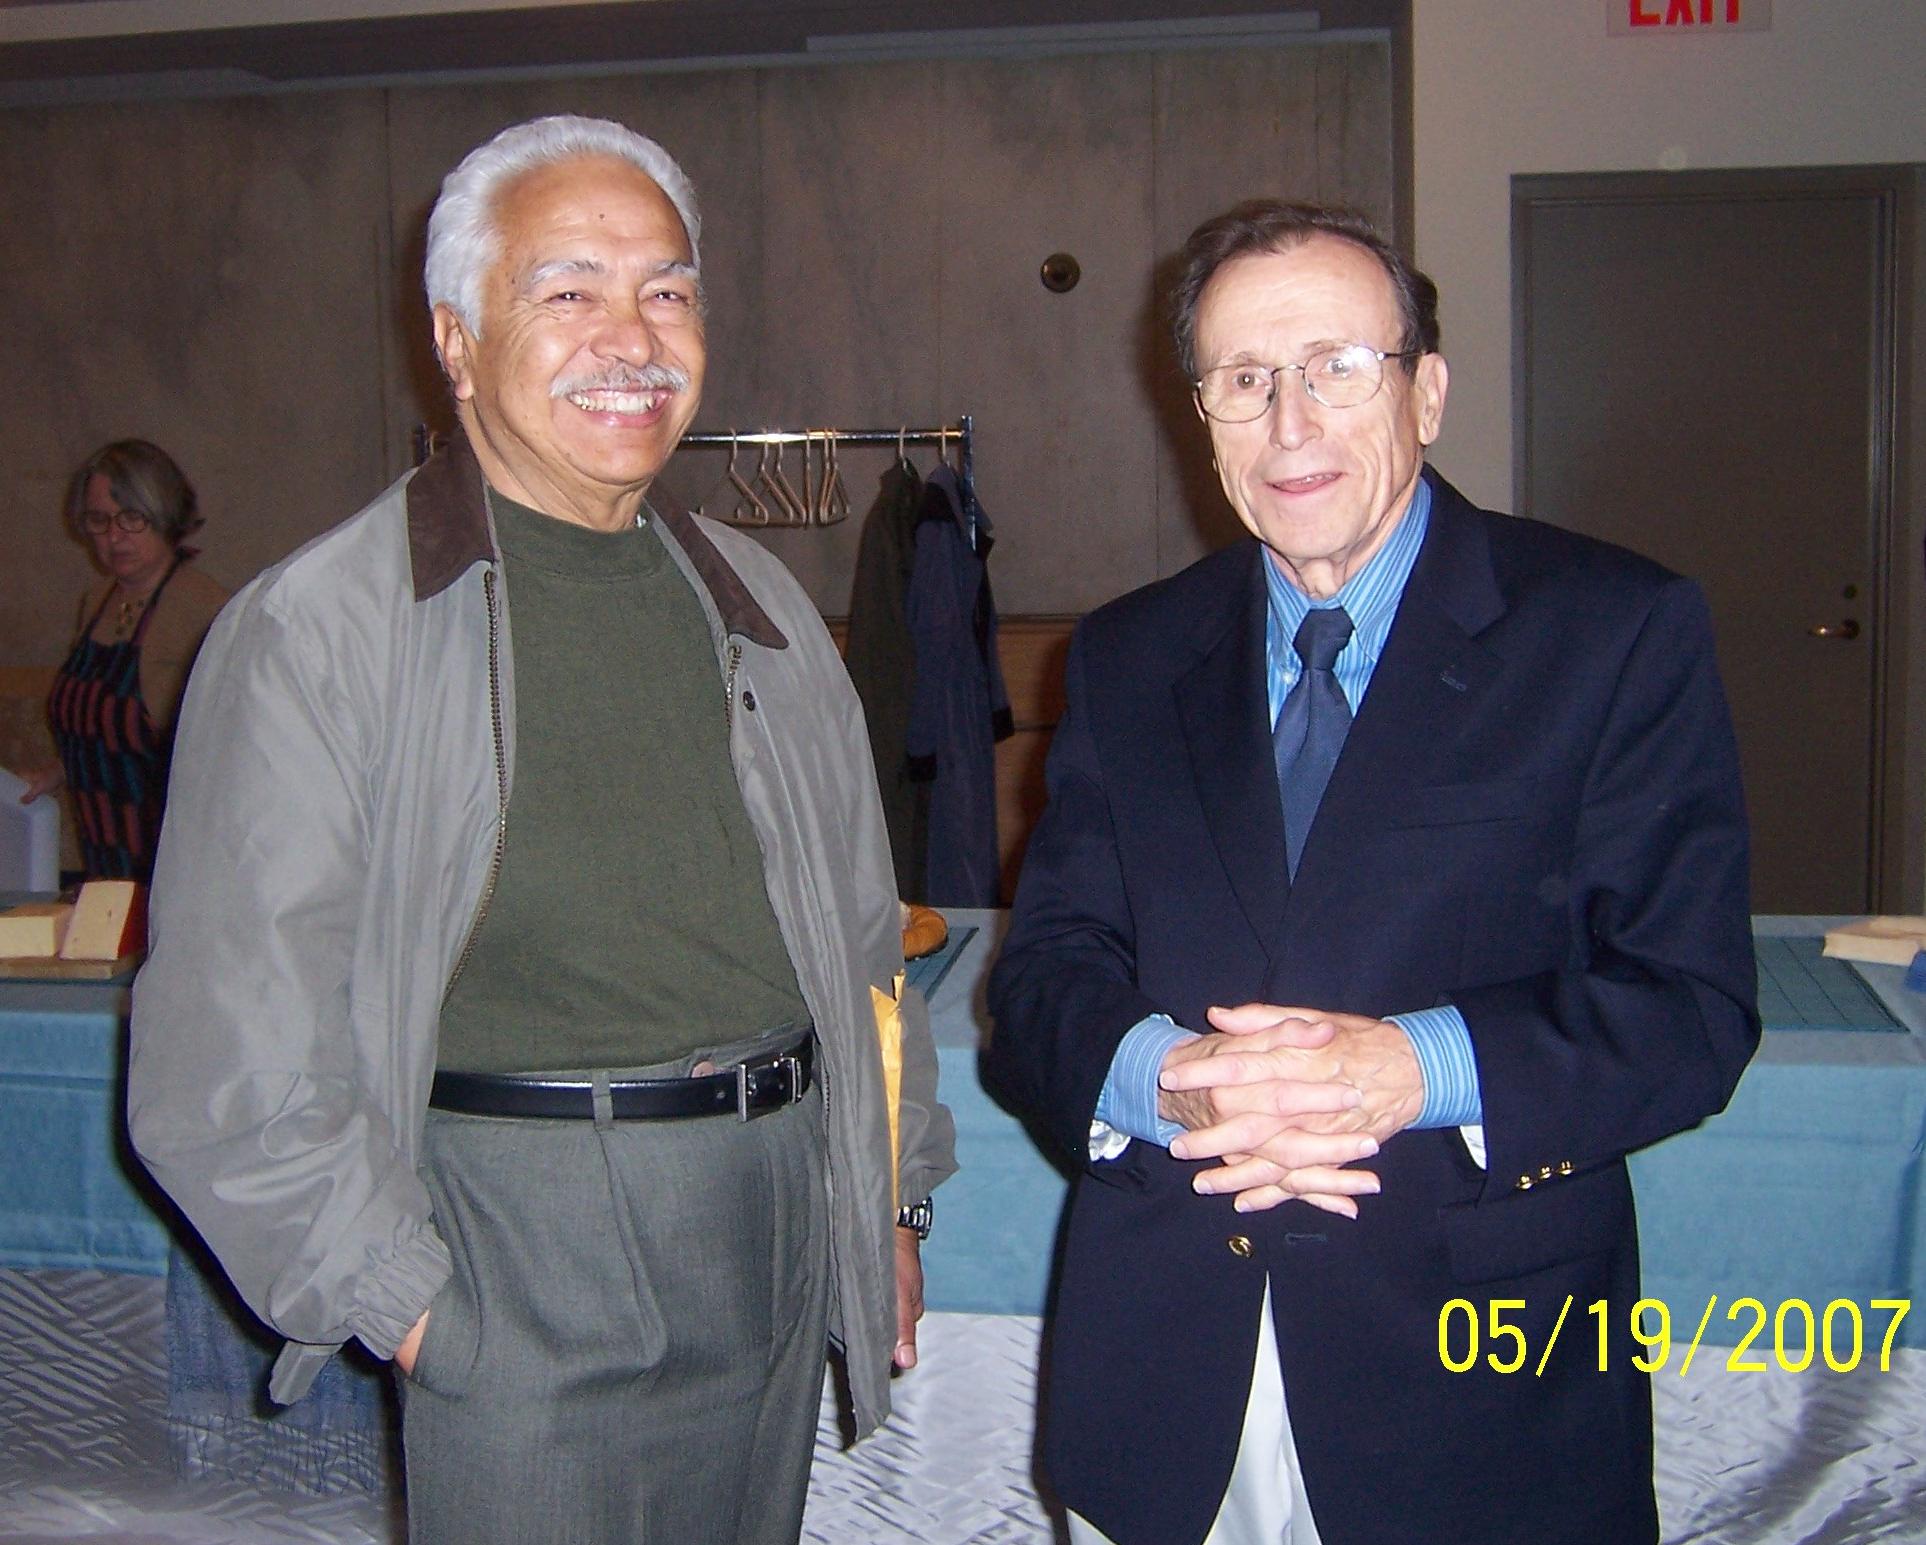 Ignacio Castuera and Tom Davis